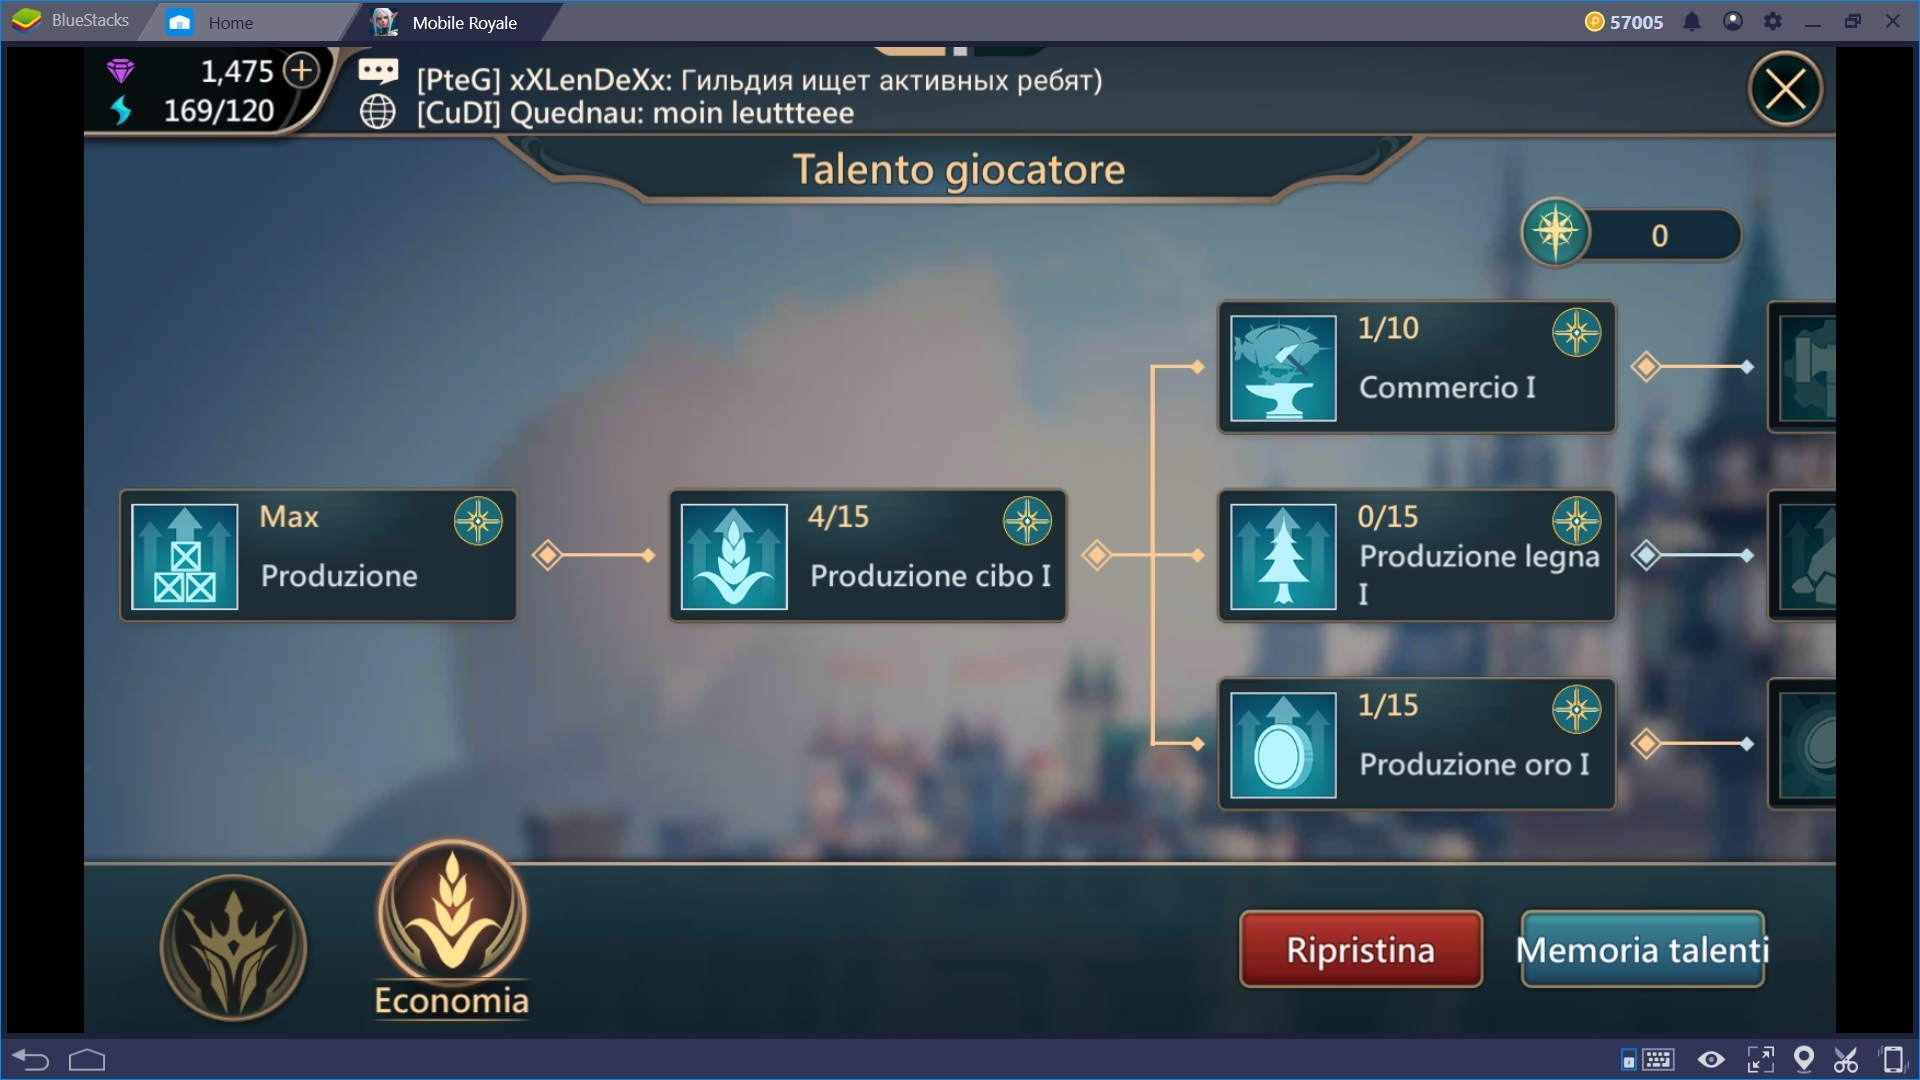 La Guida Introduttiva a Mobile Royale